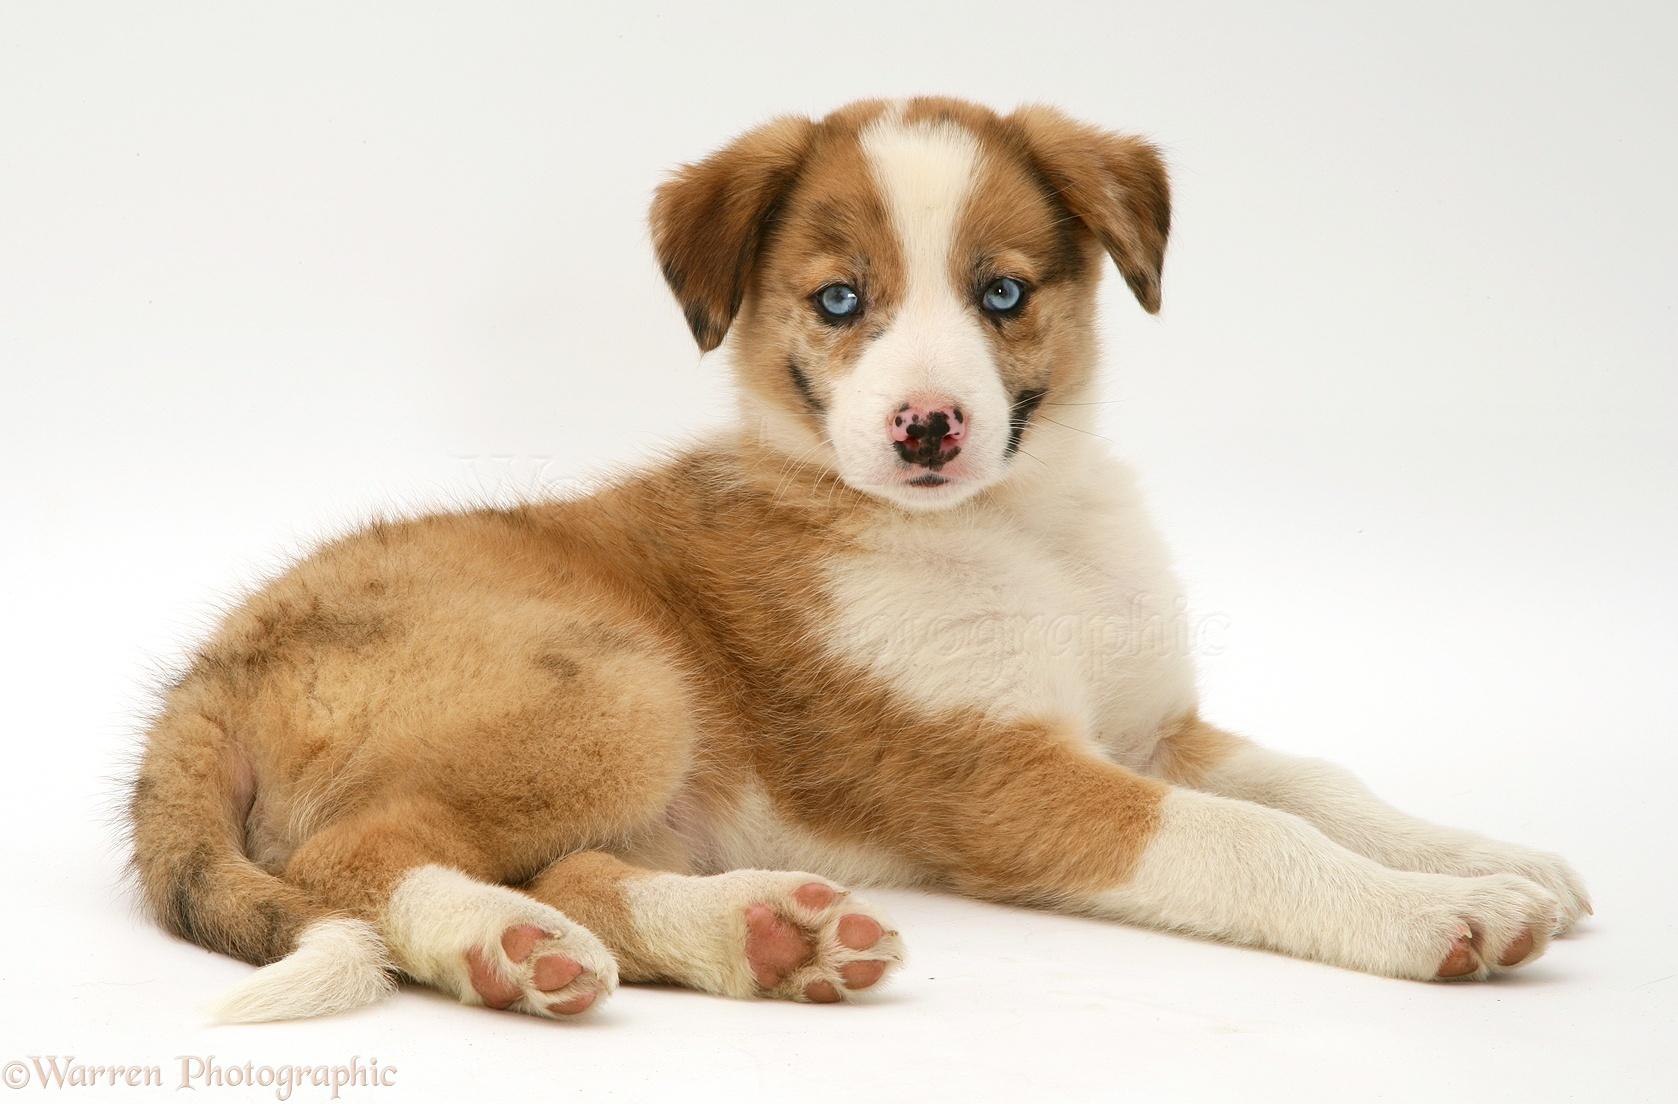 Dog Blue Eyed Red Merle Border Collie Puppy Photo Wp10757